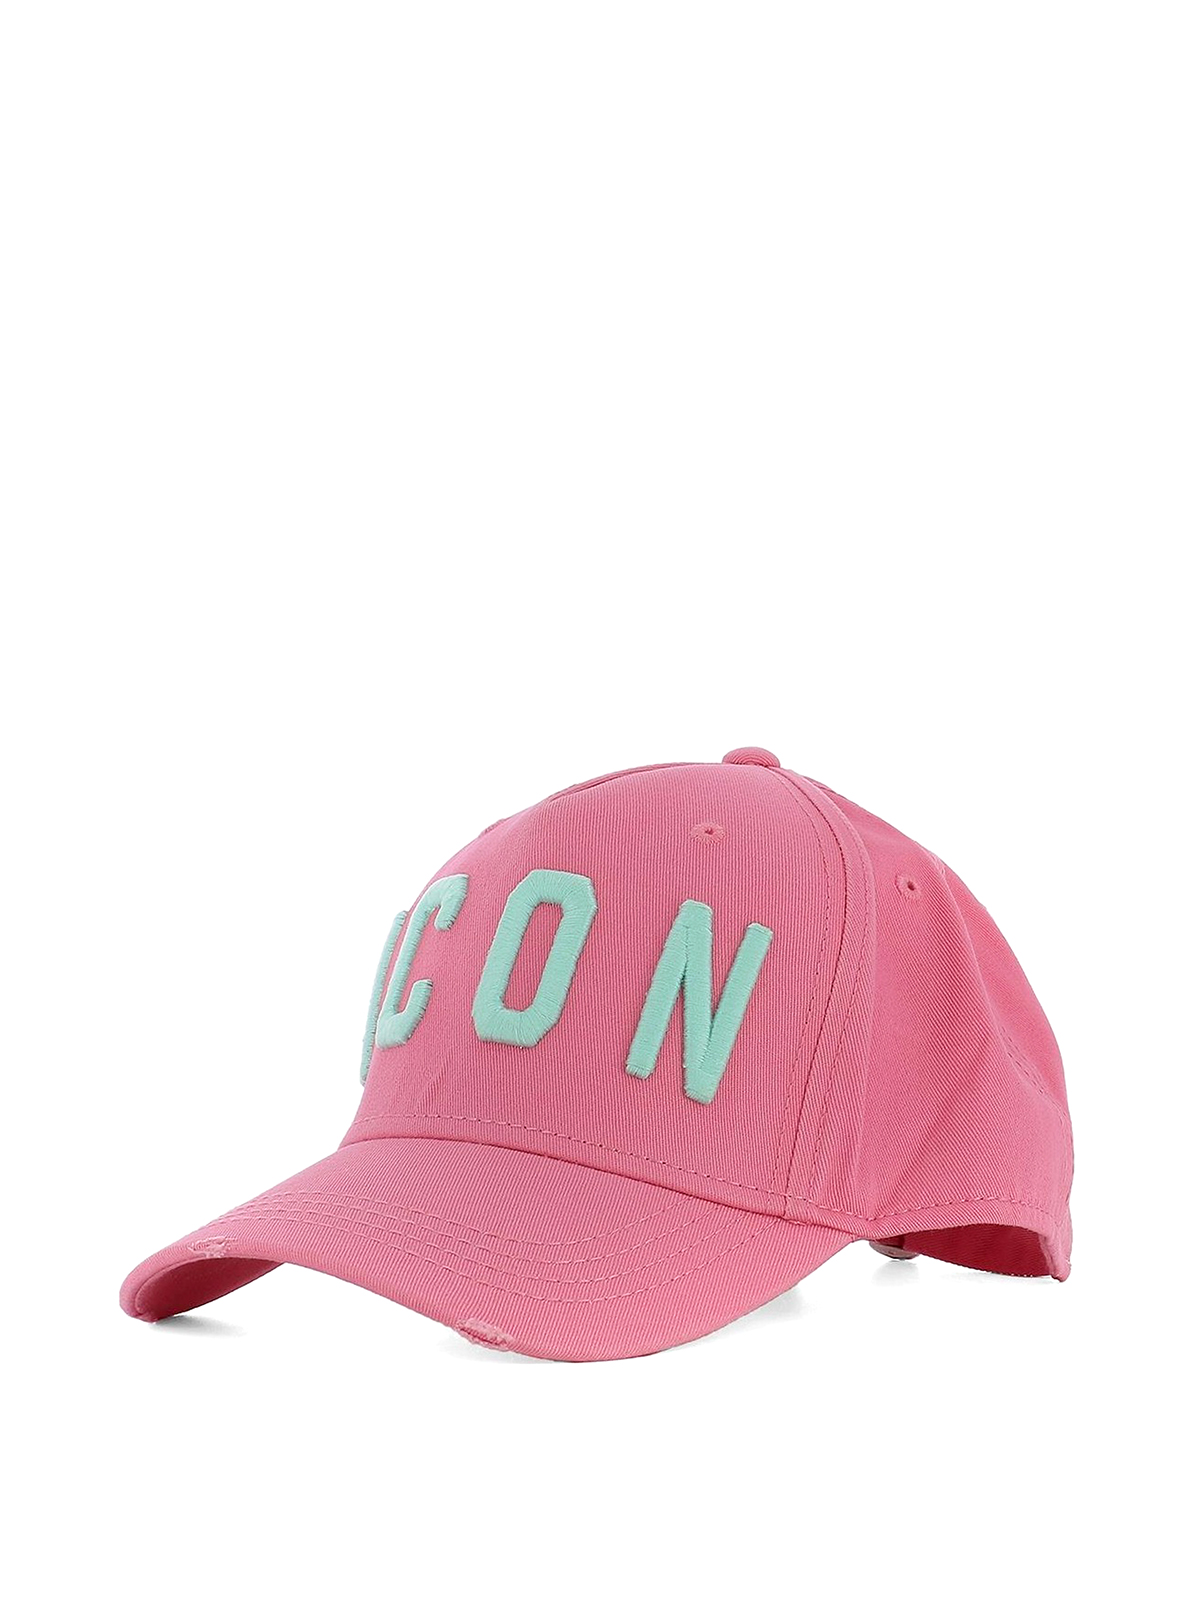 d885b0626 Dsquared2 - Icon pink baseball cap - hats & caps - BCM400105C00001M1387